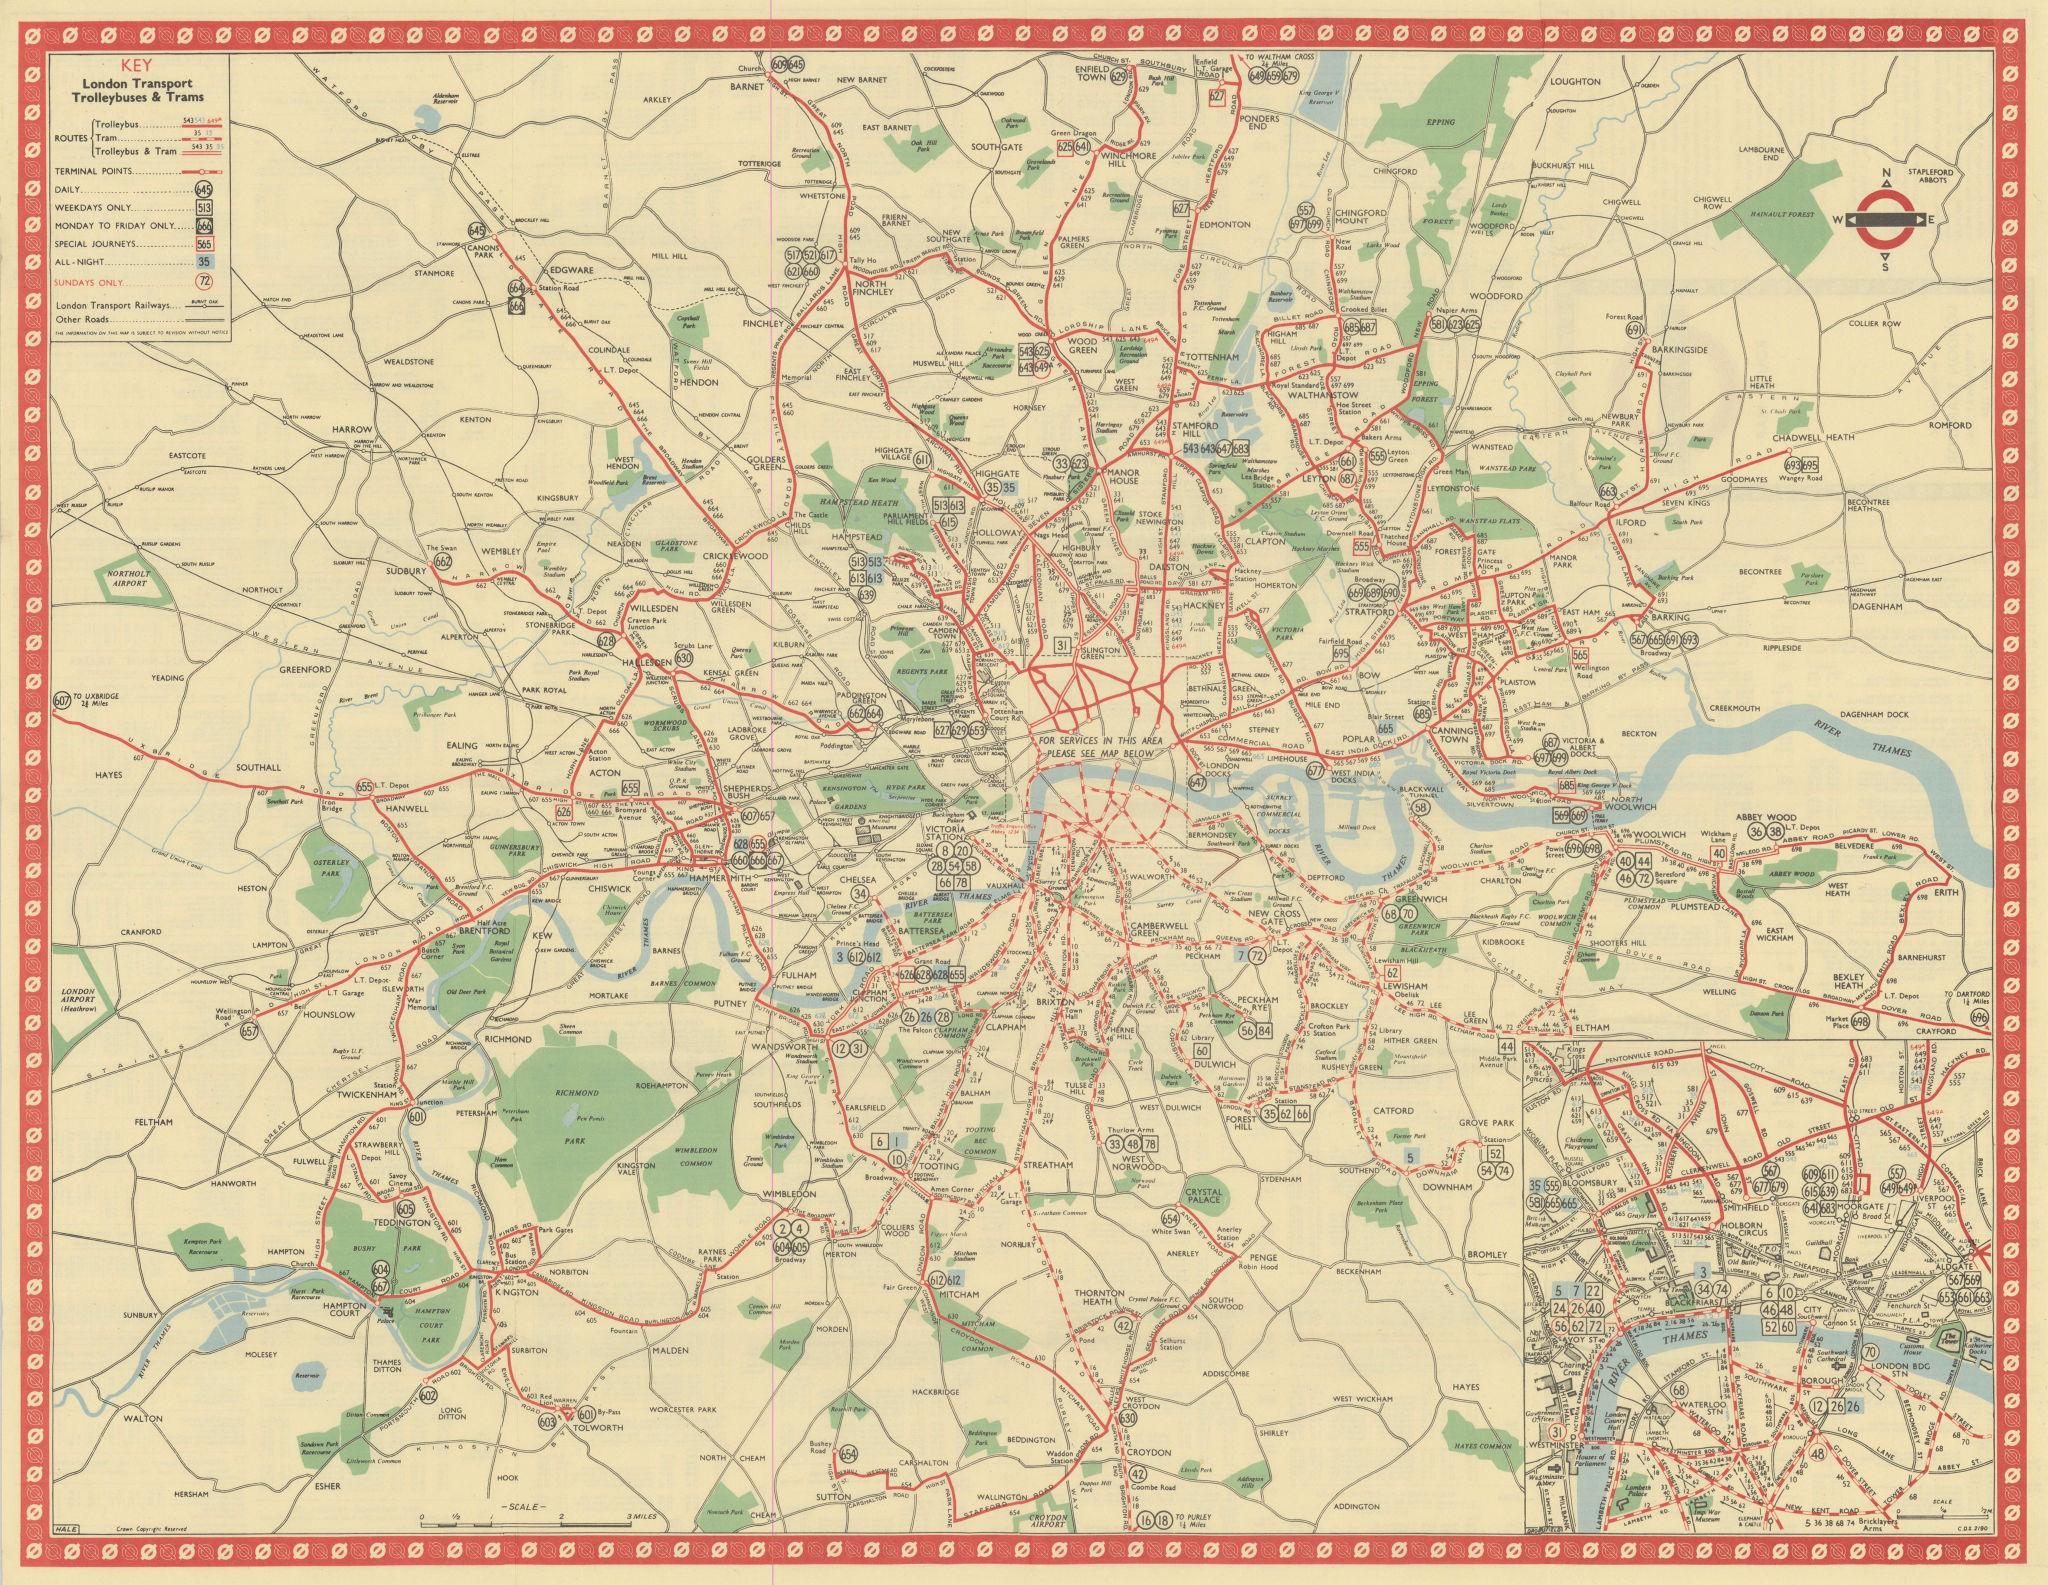 London Transport Trolleybus & Tram route map. HALE. January 1950 old